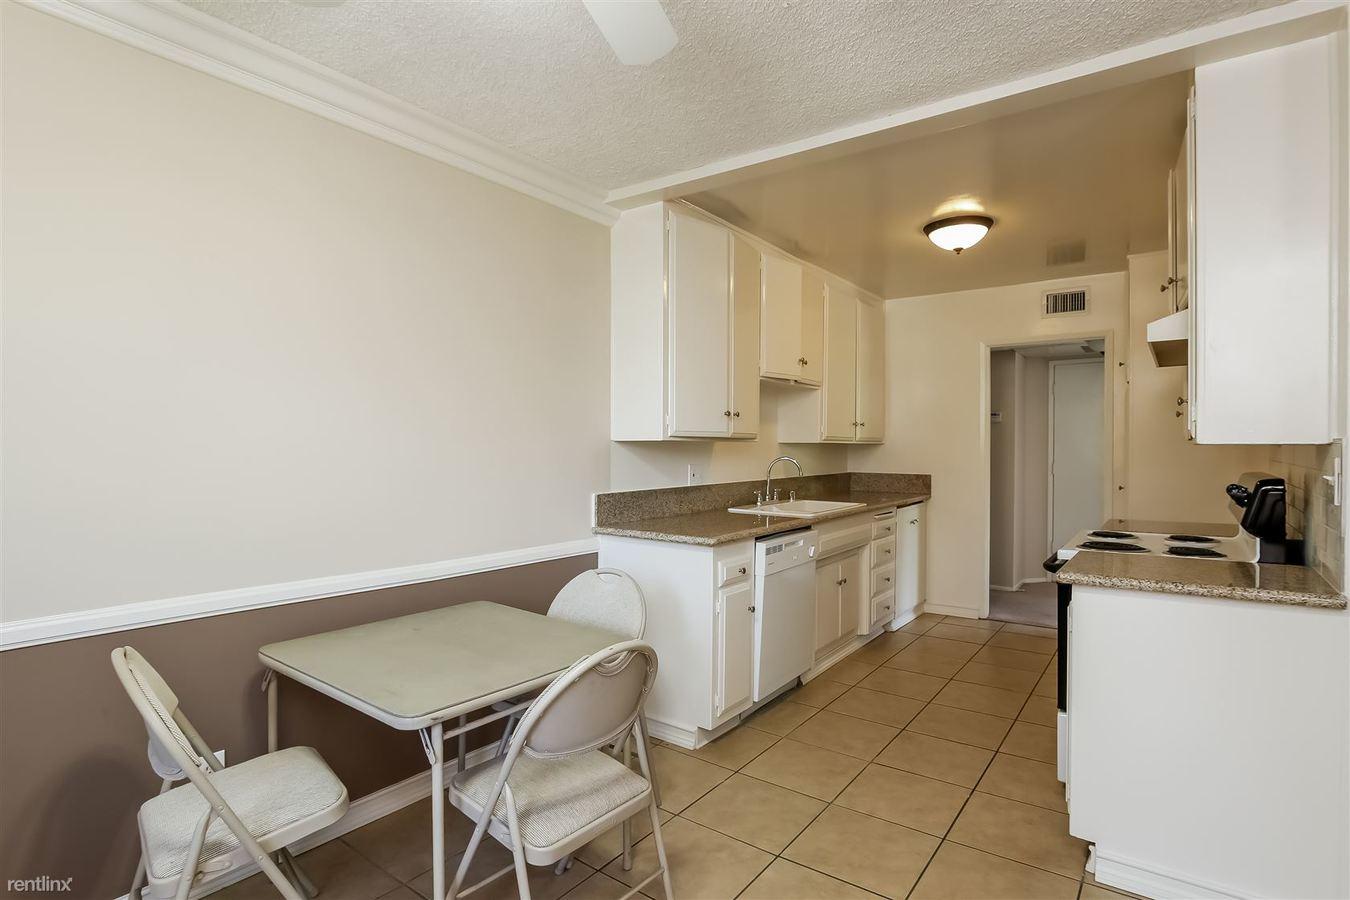 2 Bedrooms 1 Bathroom Apartment for rent at Royal Oaks in San Gabriel, CA